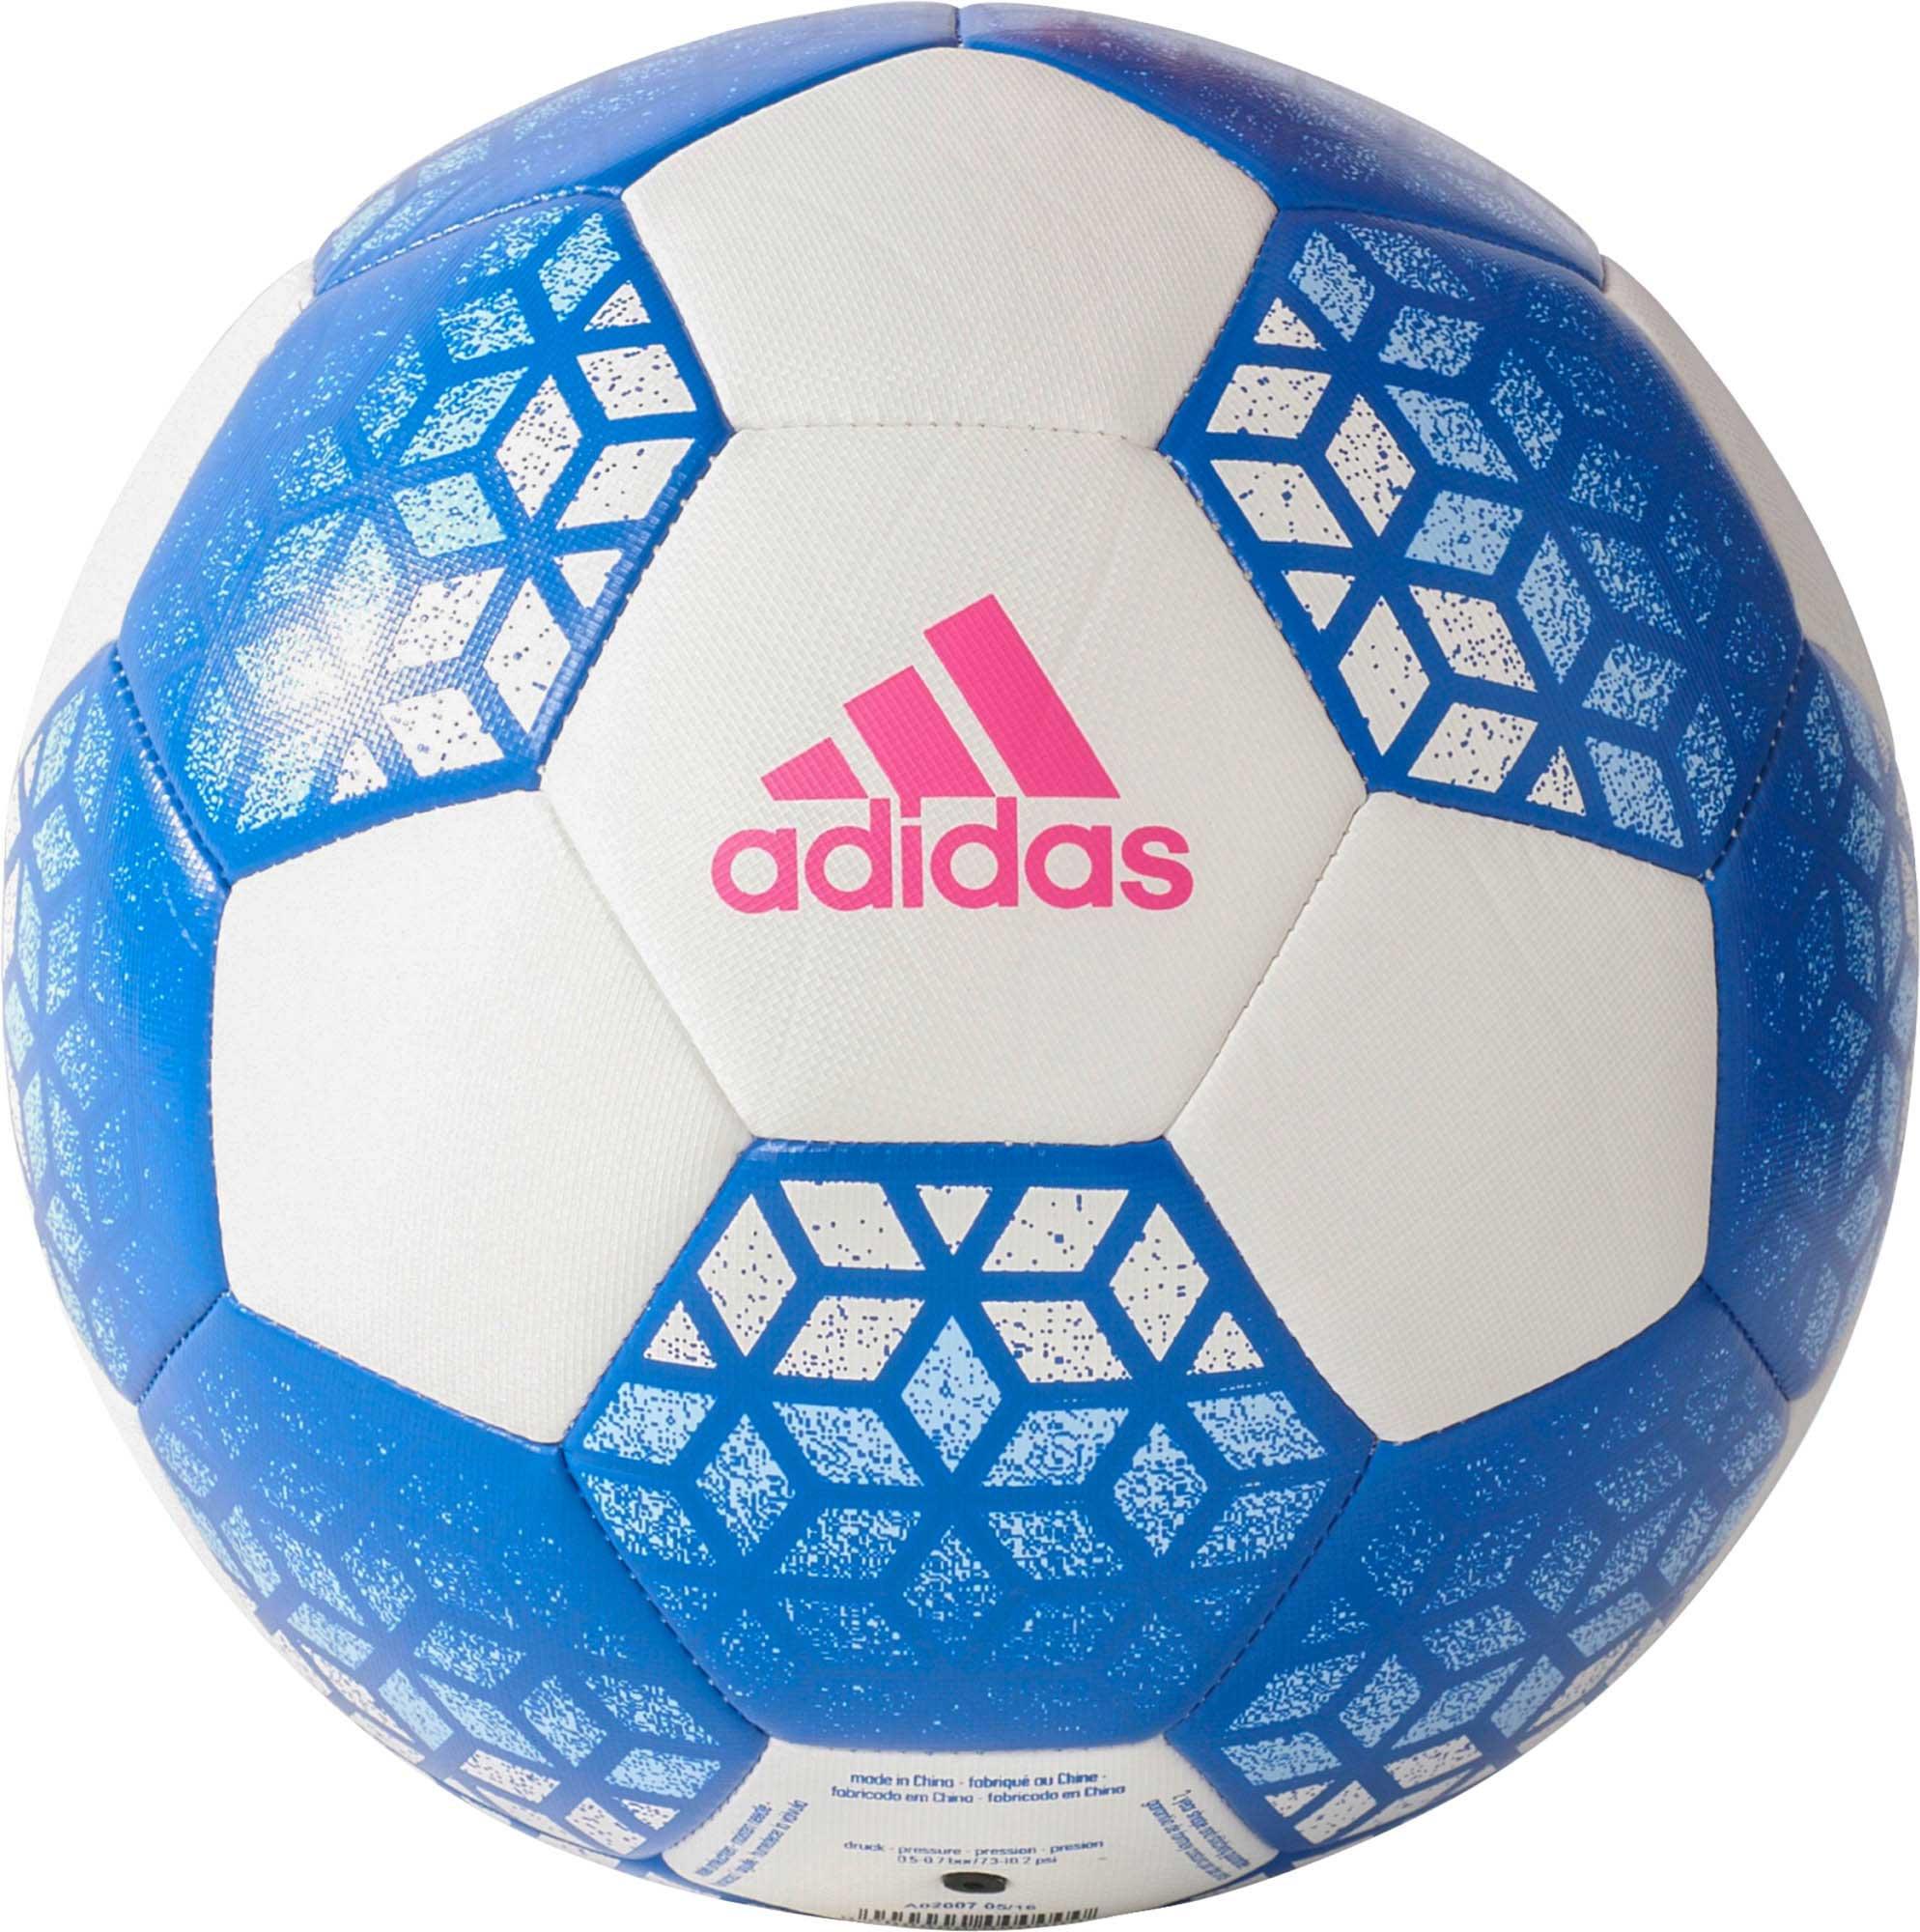 adidas ace glider soccer ball